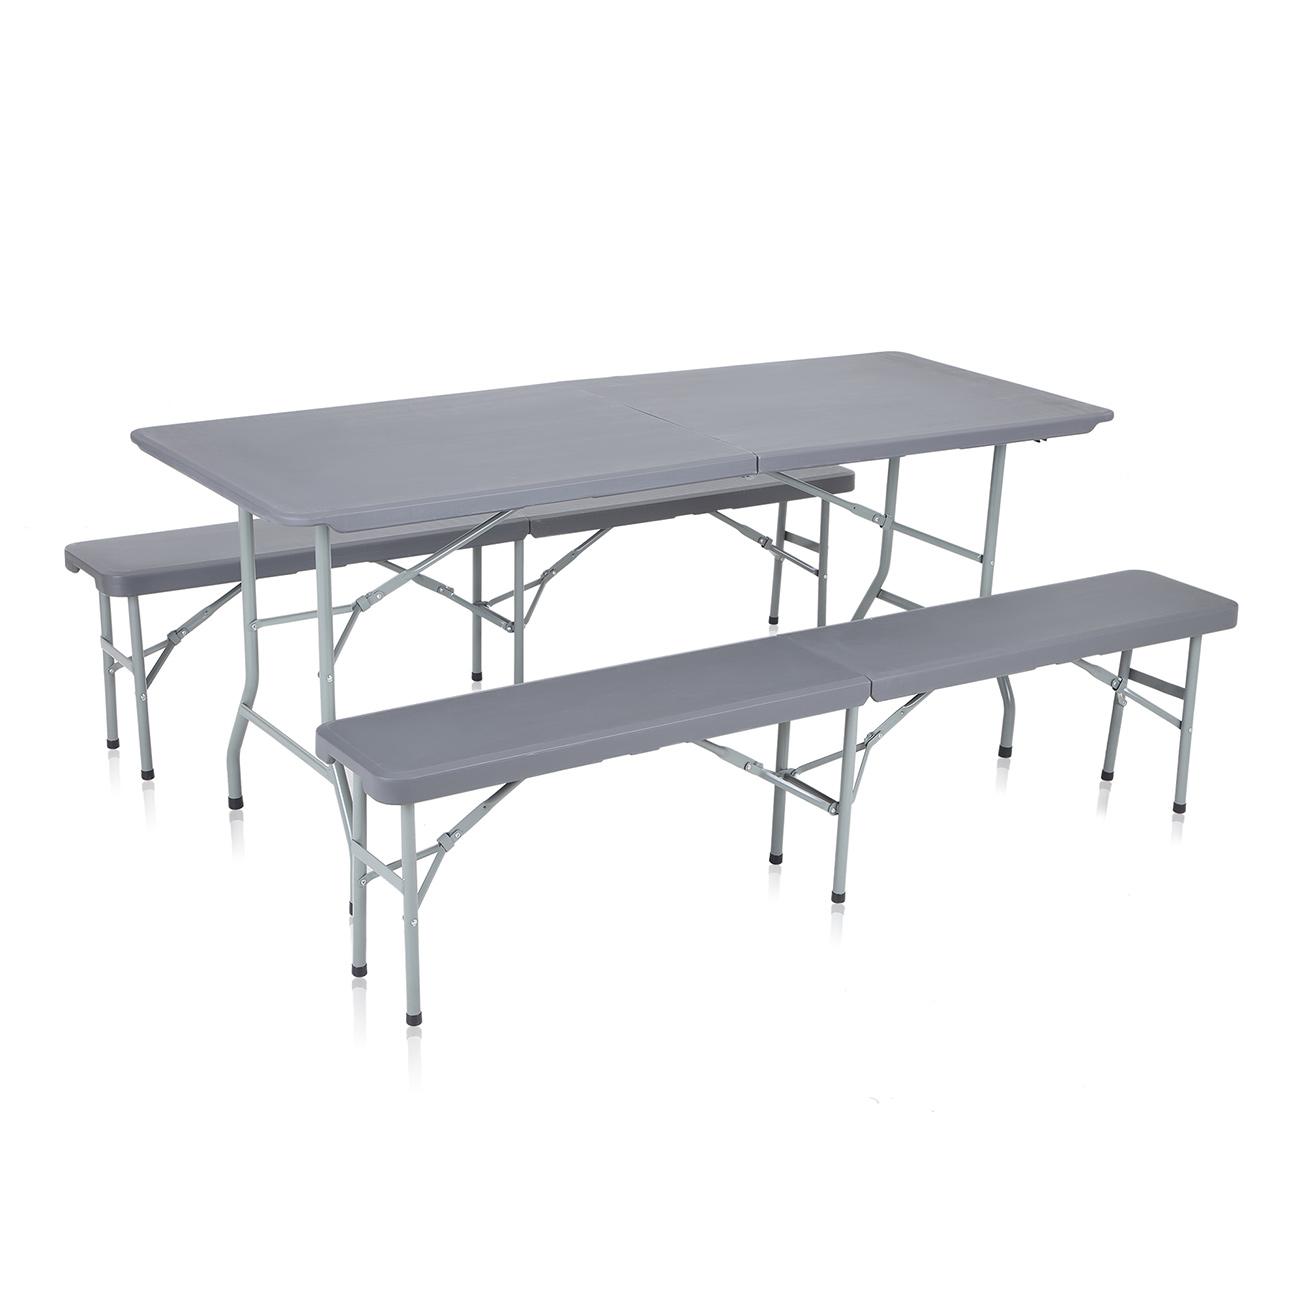 strattore set de jardin en plastique 2x banc et table. Black Bedroom Furniture Sets. Home Design Ideas